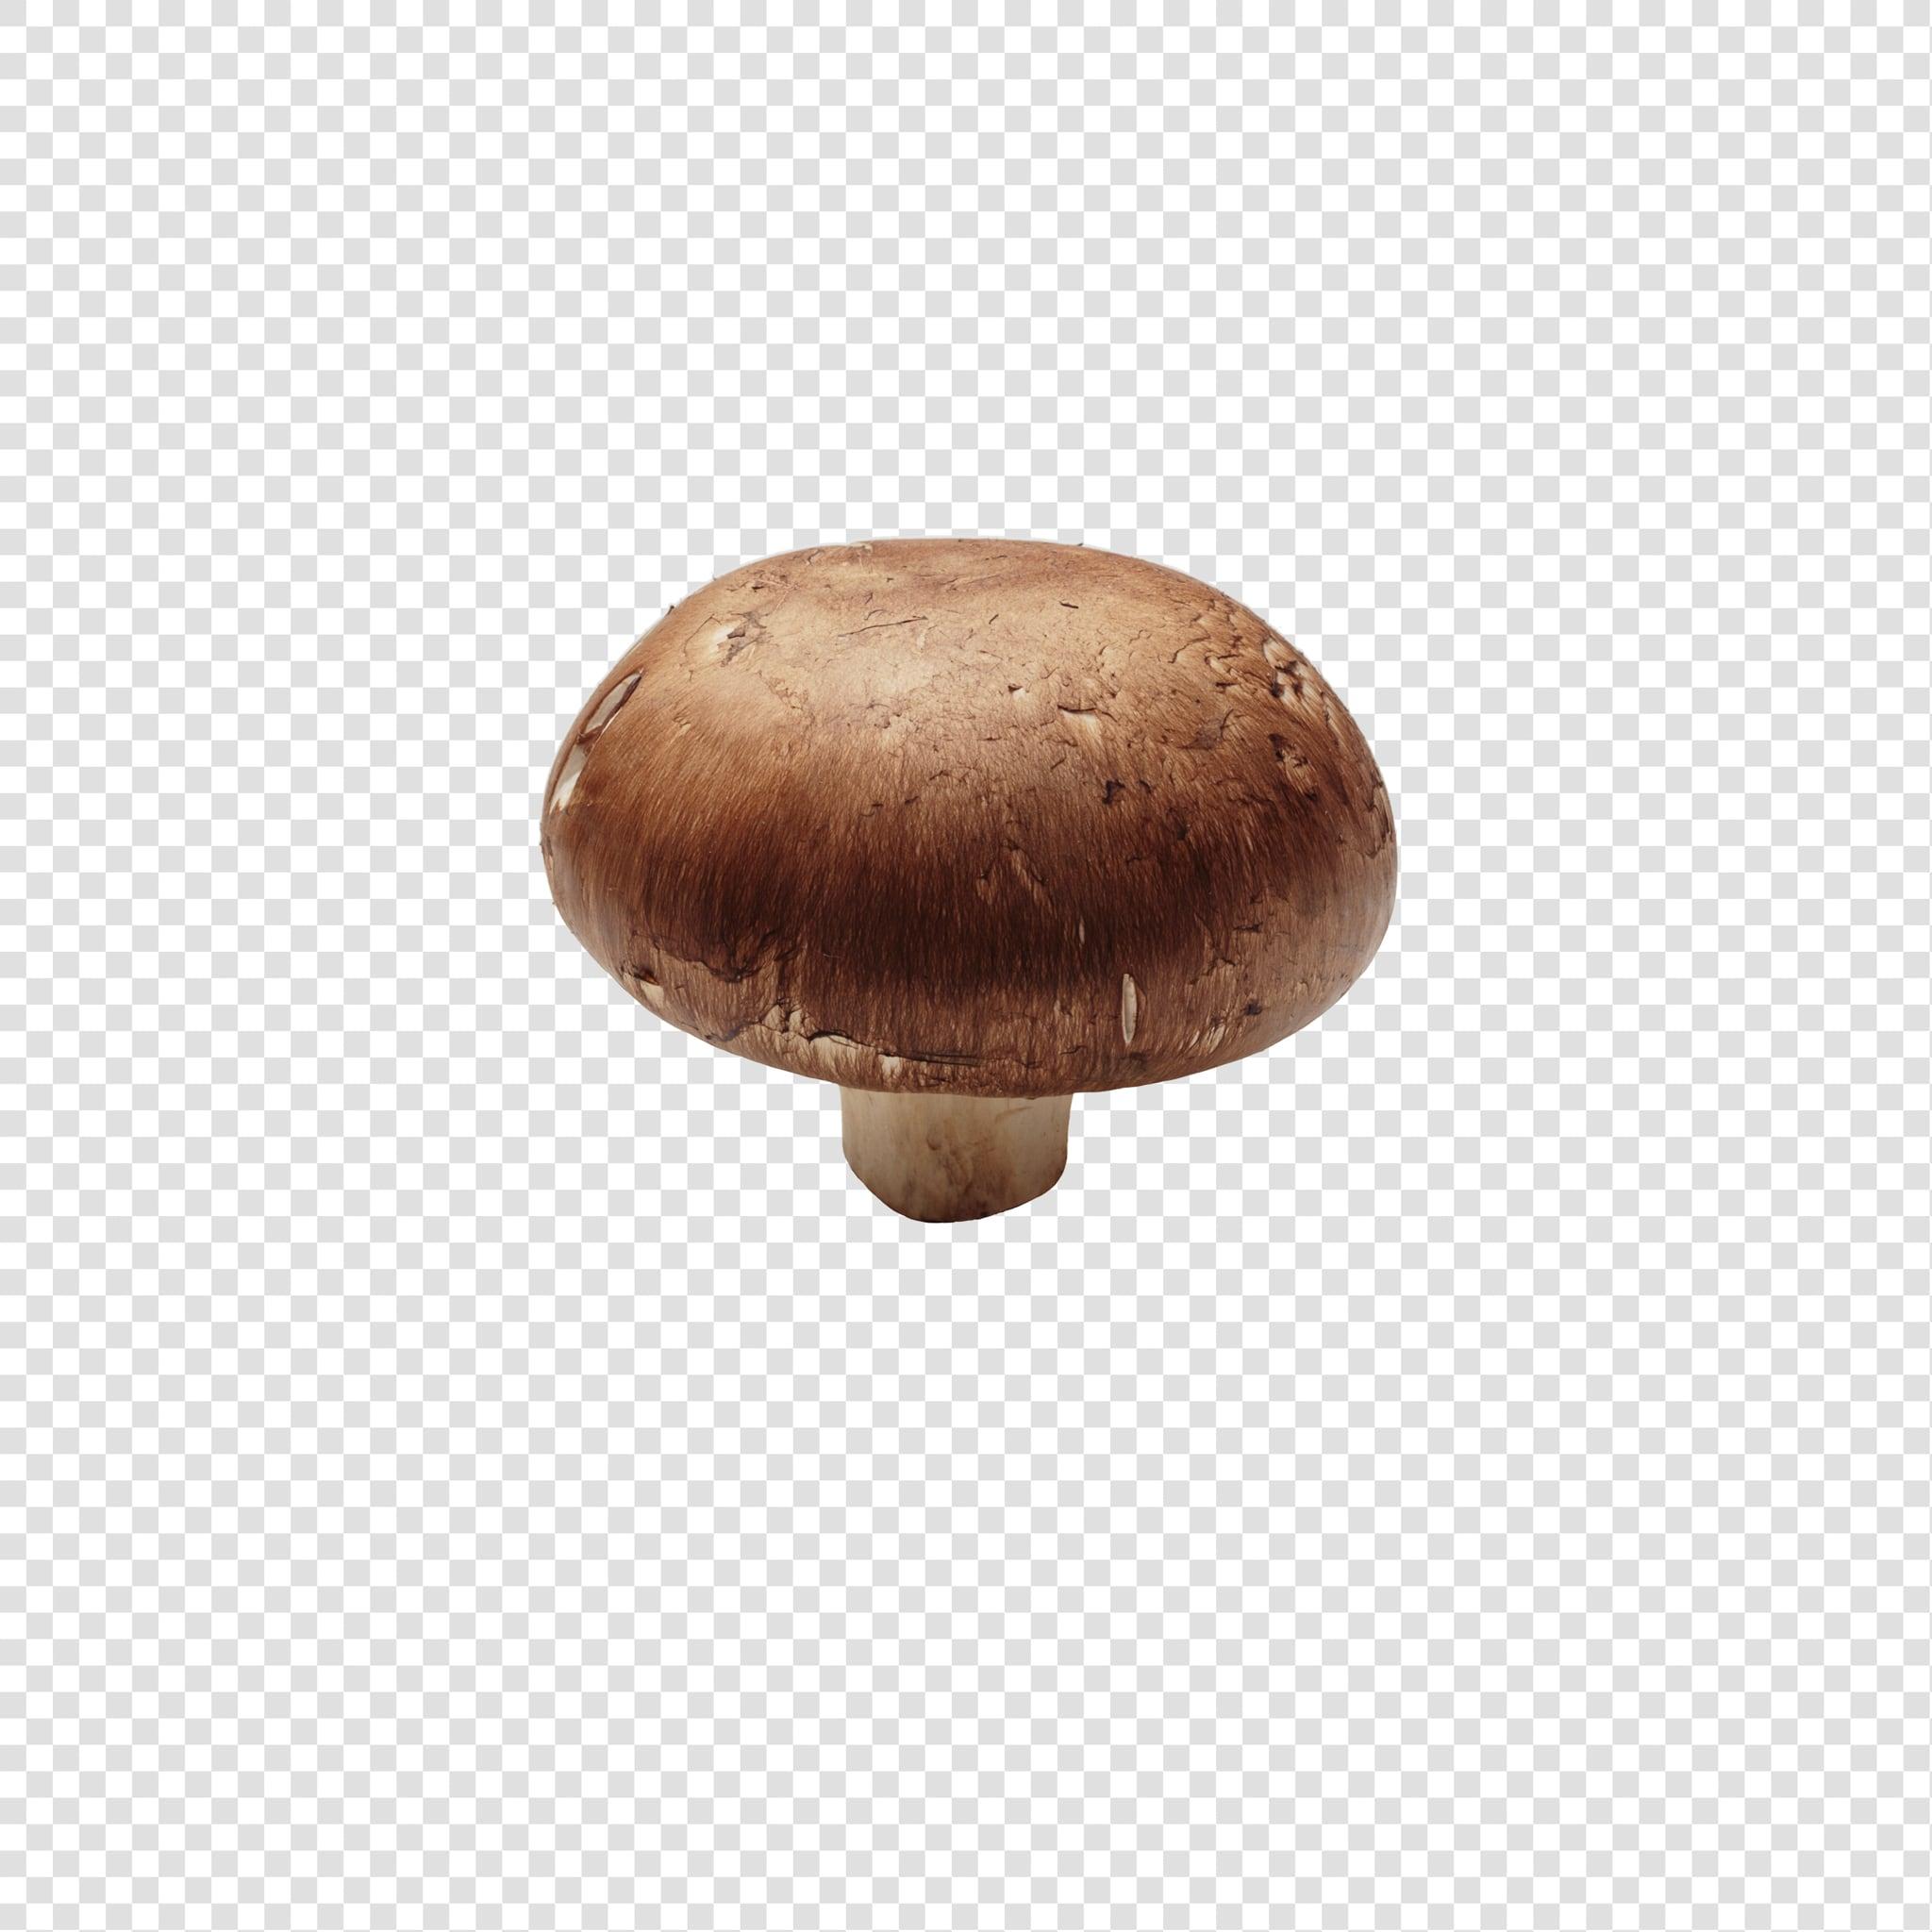 Champignon image asset with transparent background